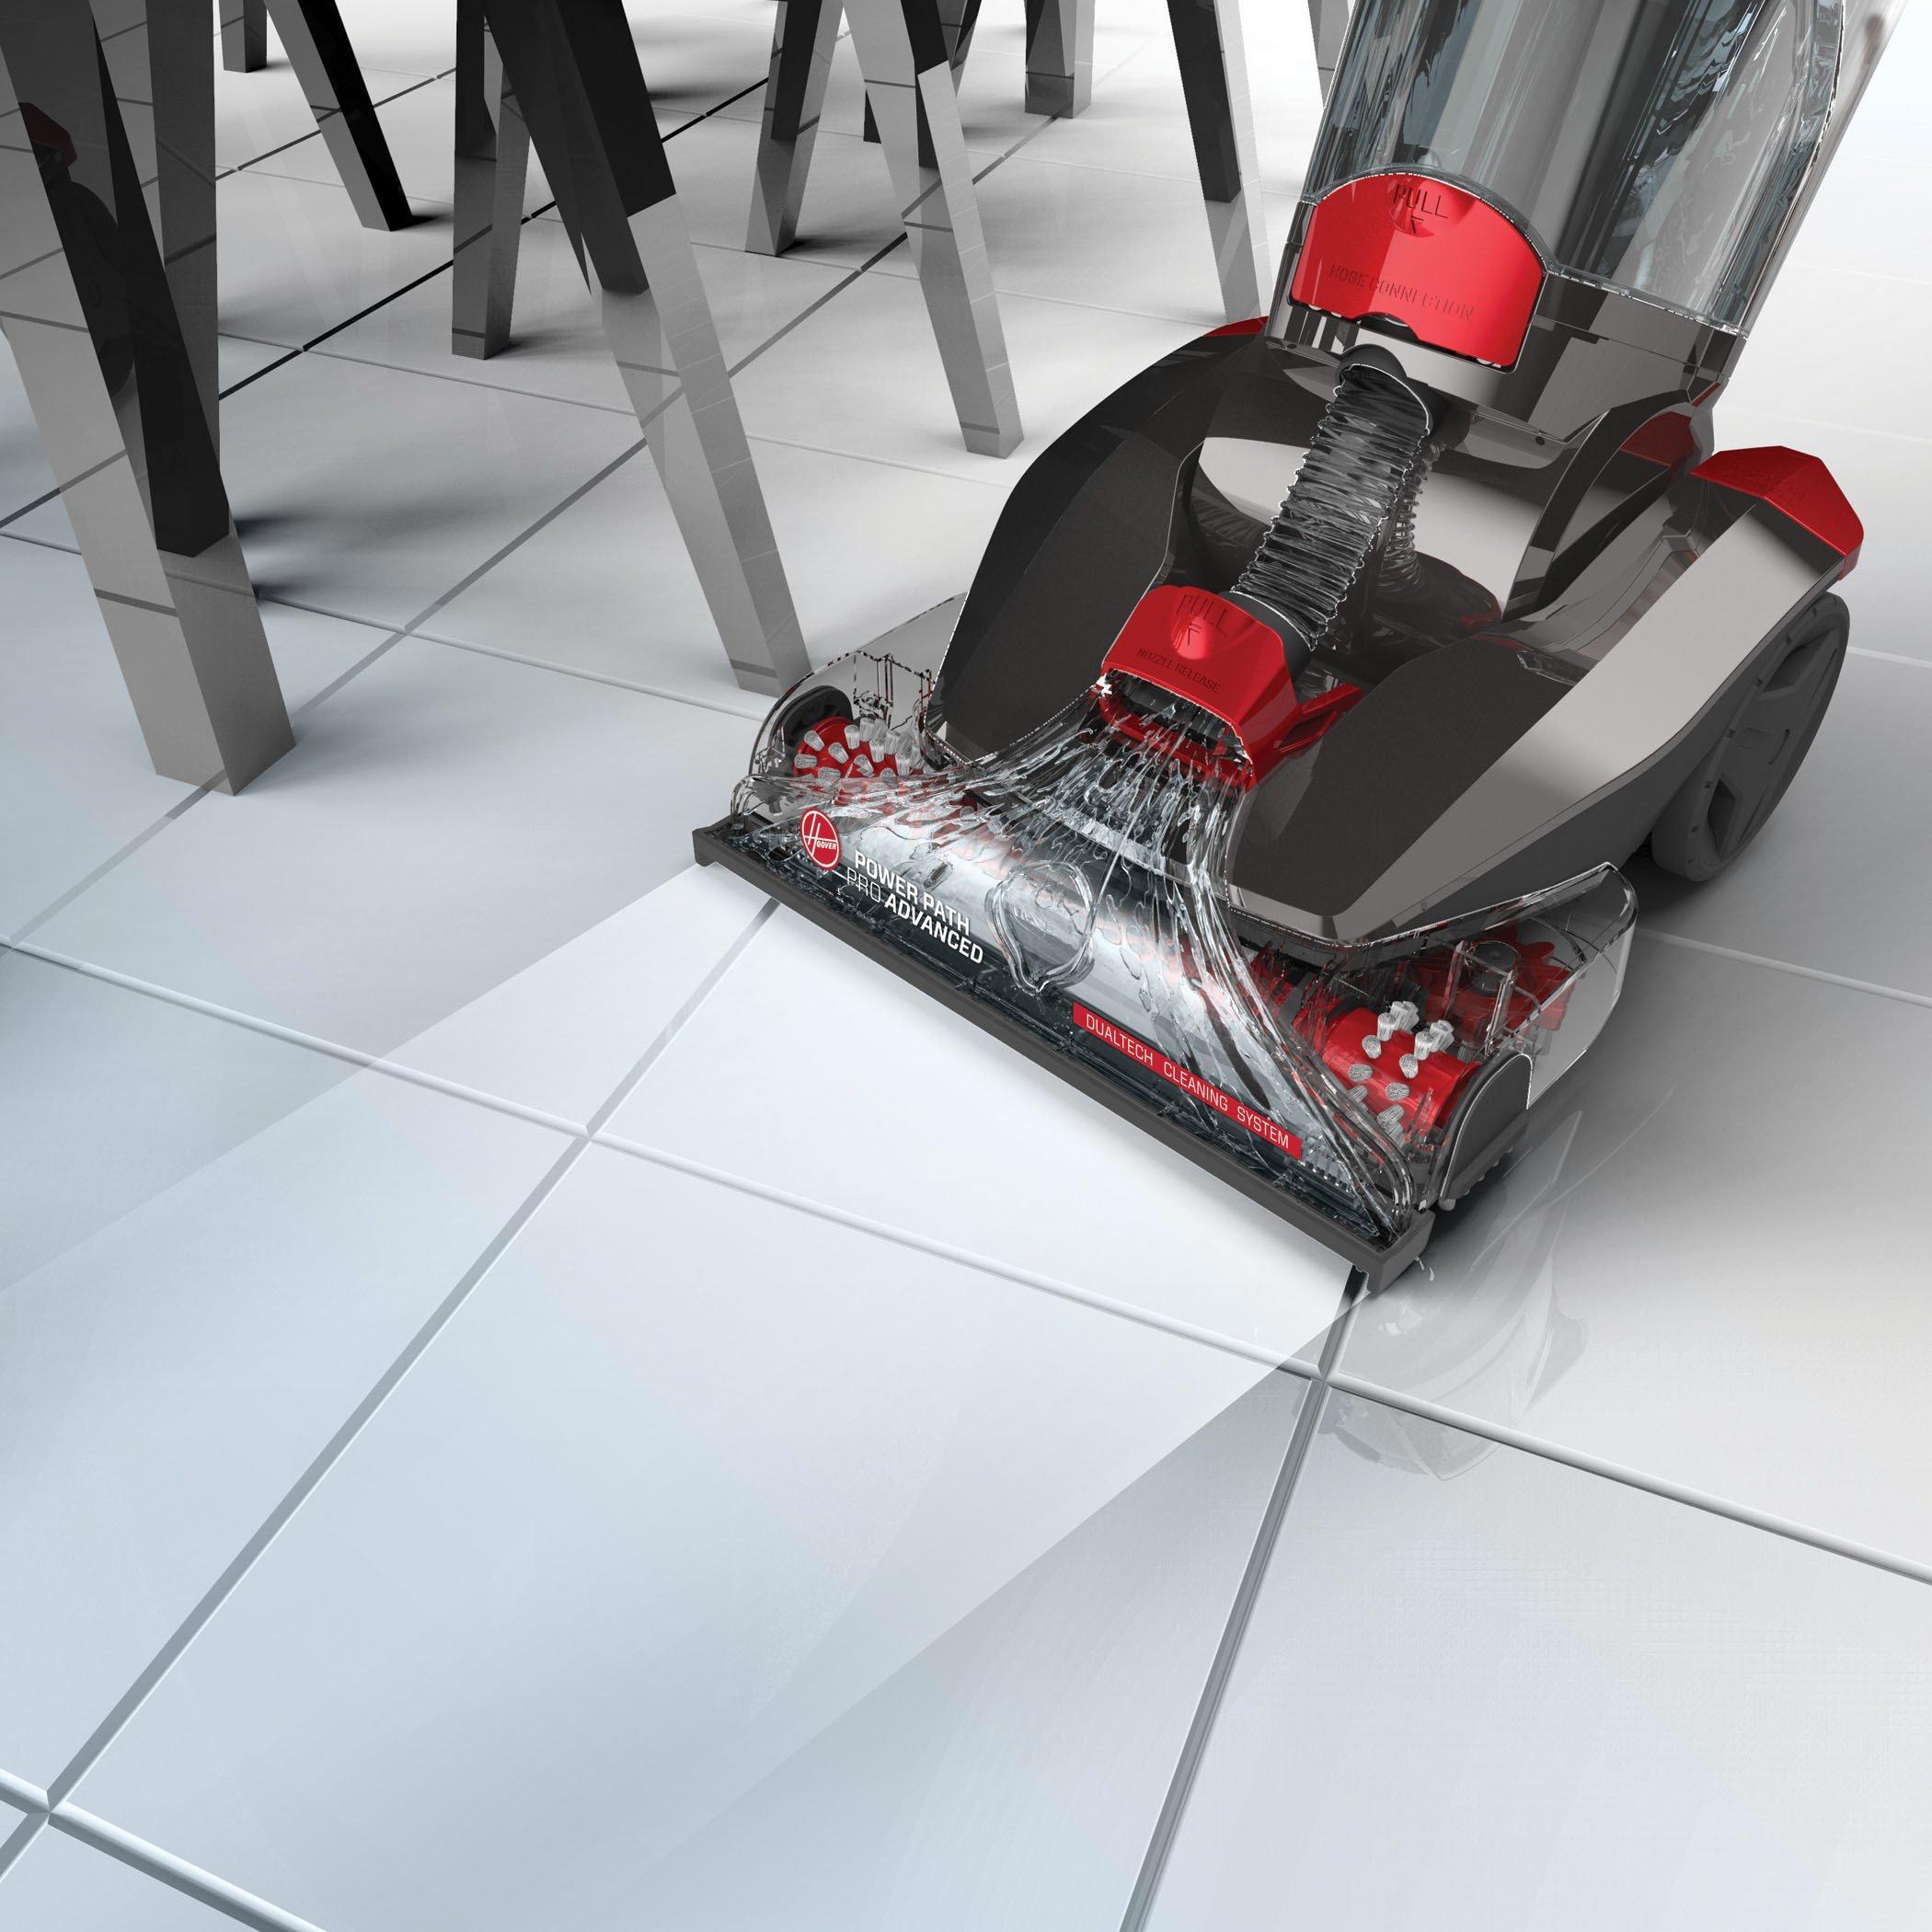 Power Path Pro Carpet Cleaner6